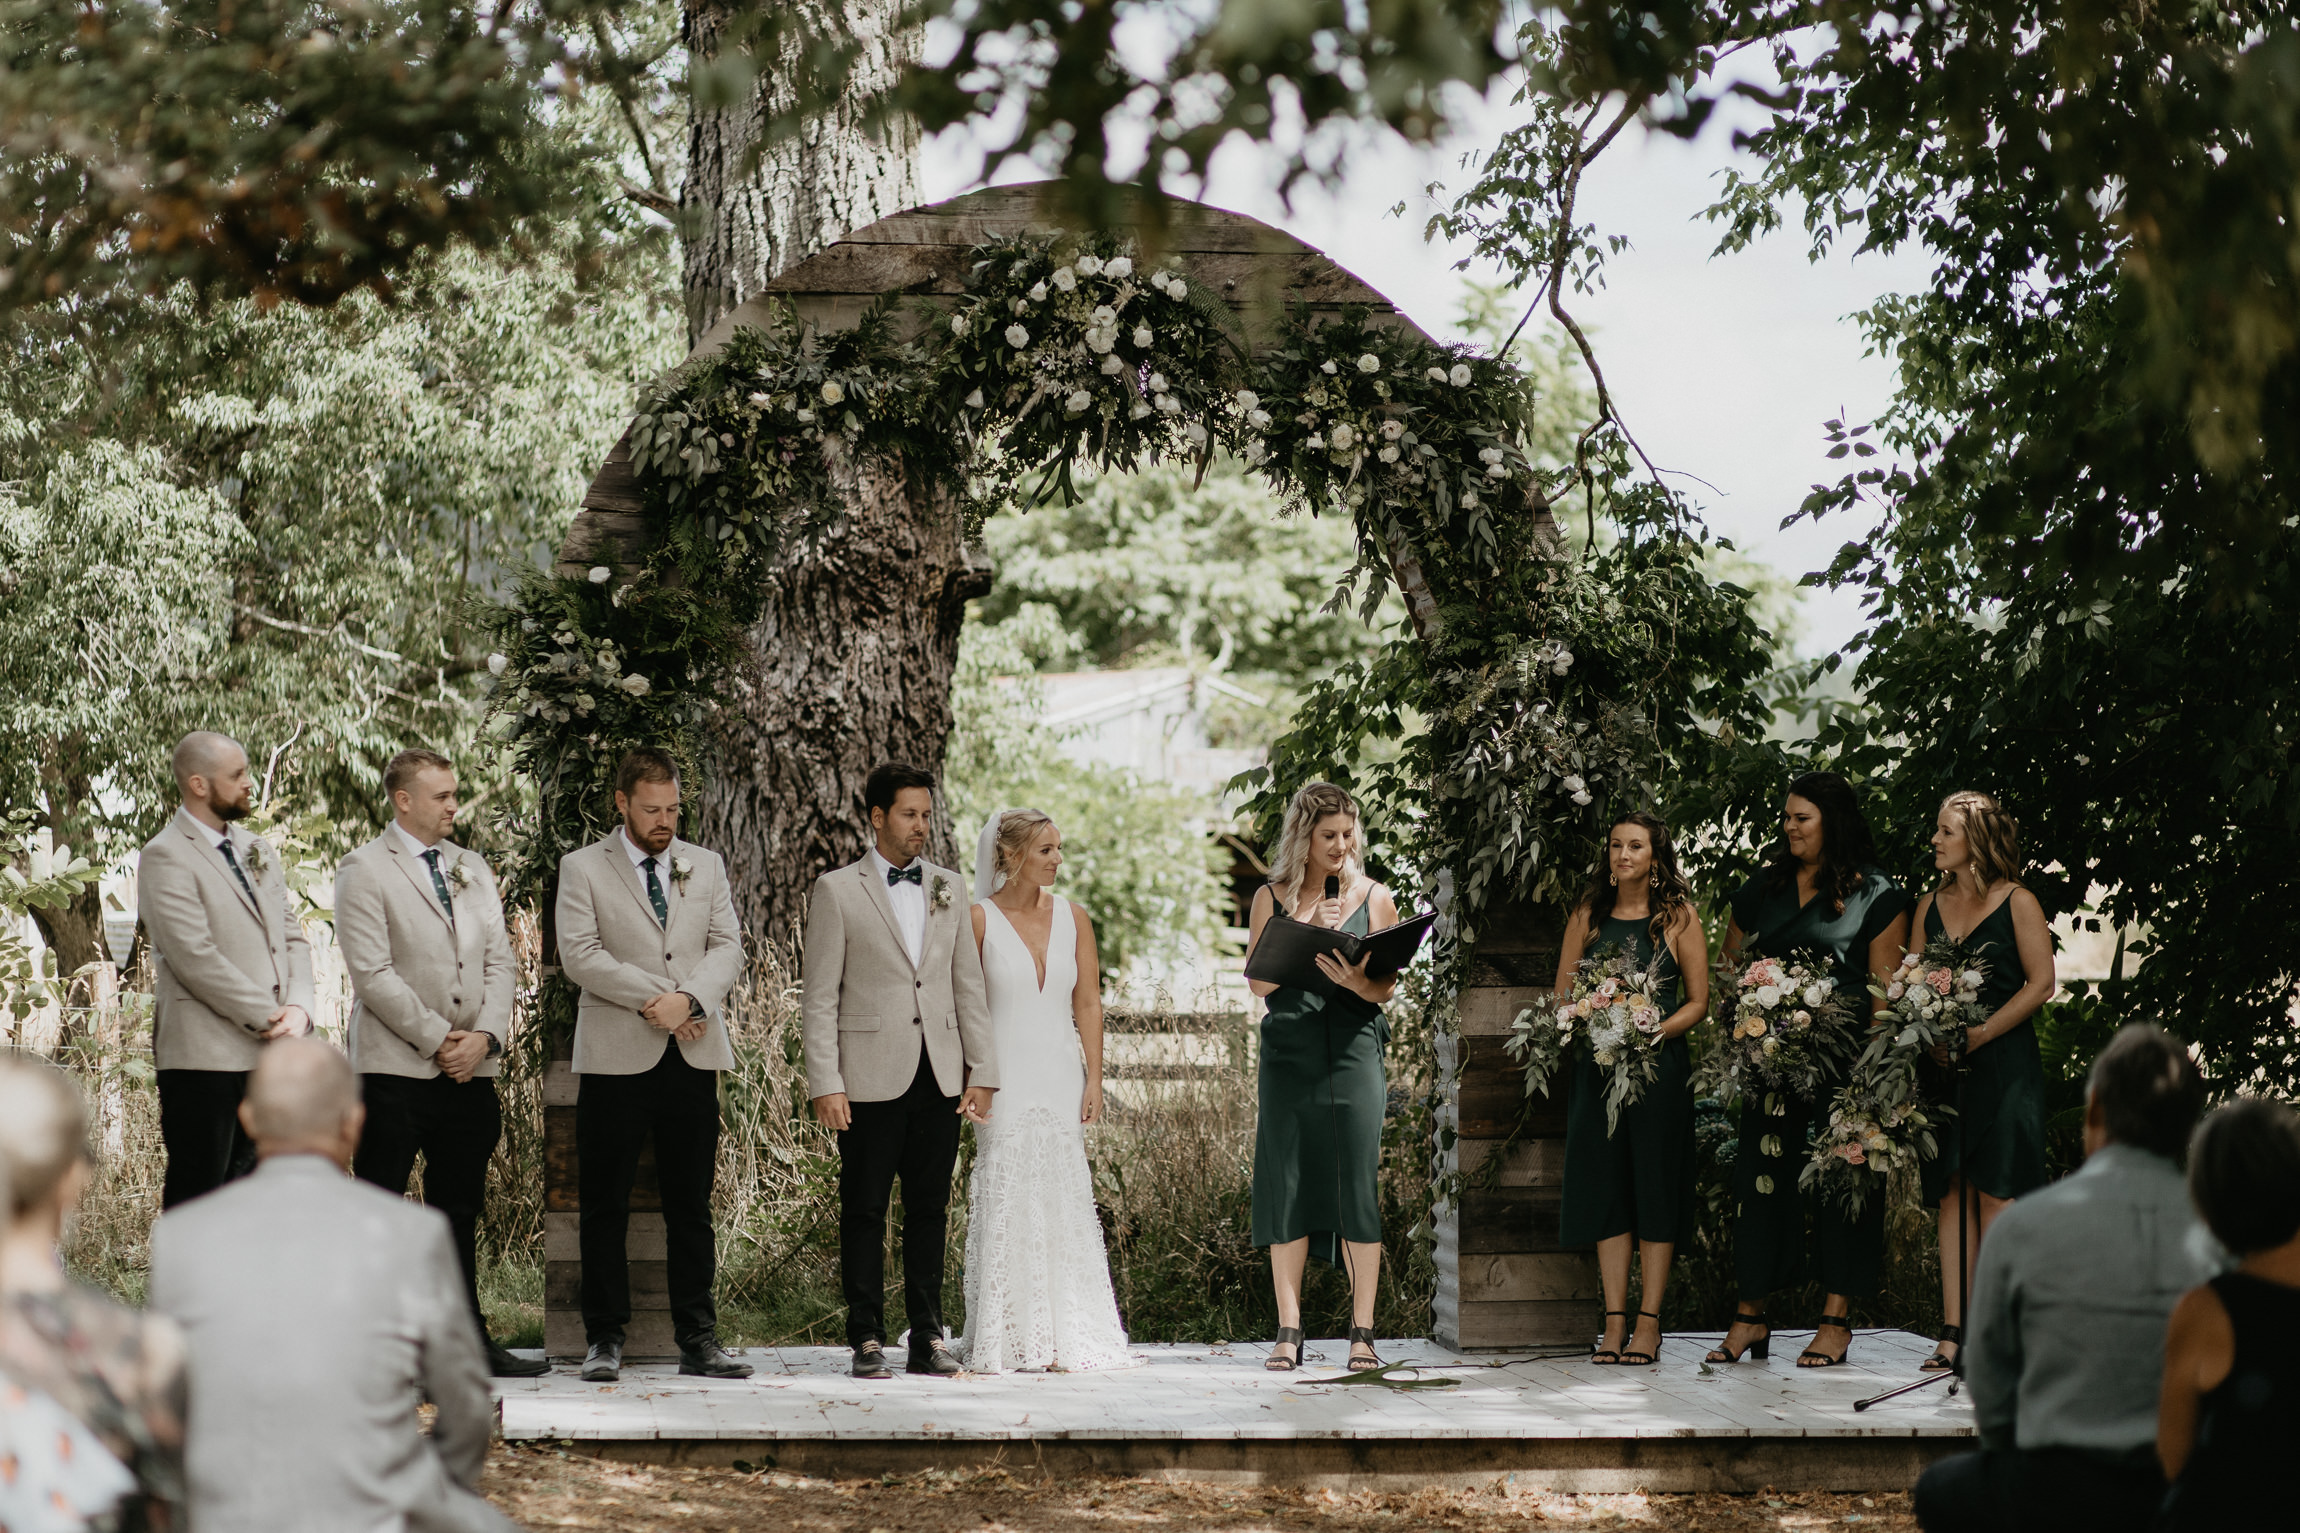 oldforestschool-wedding-blog-101.jpg